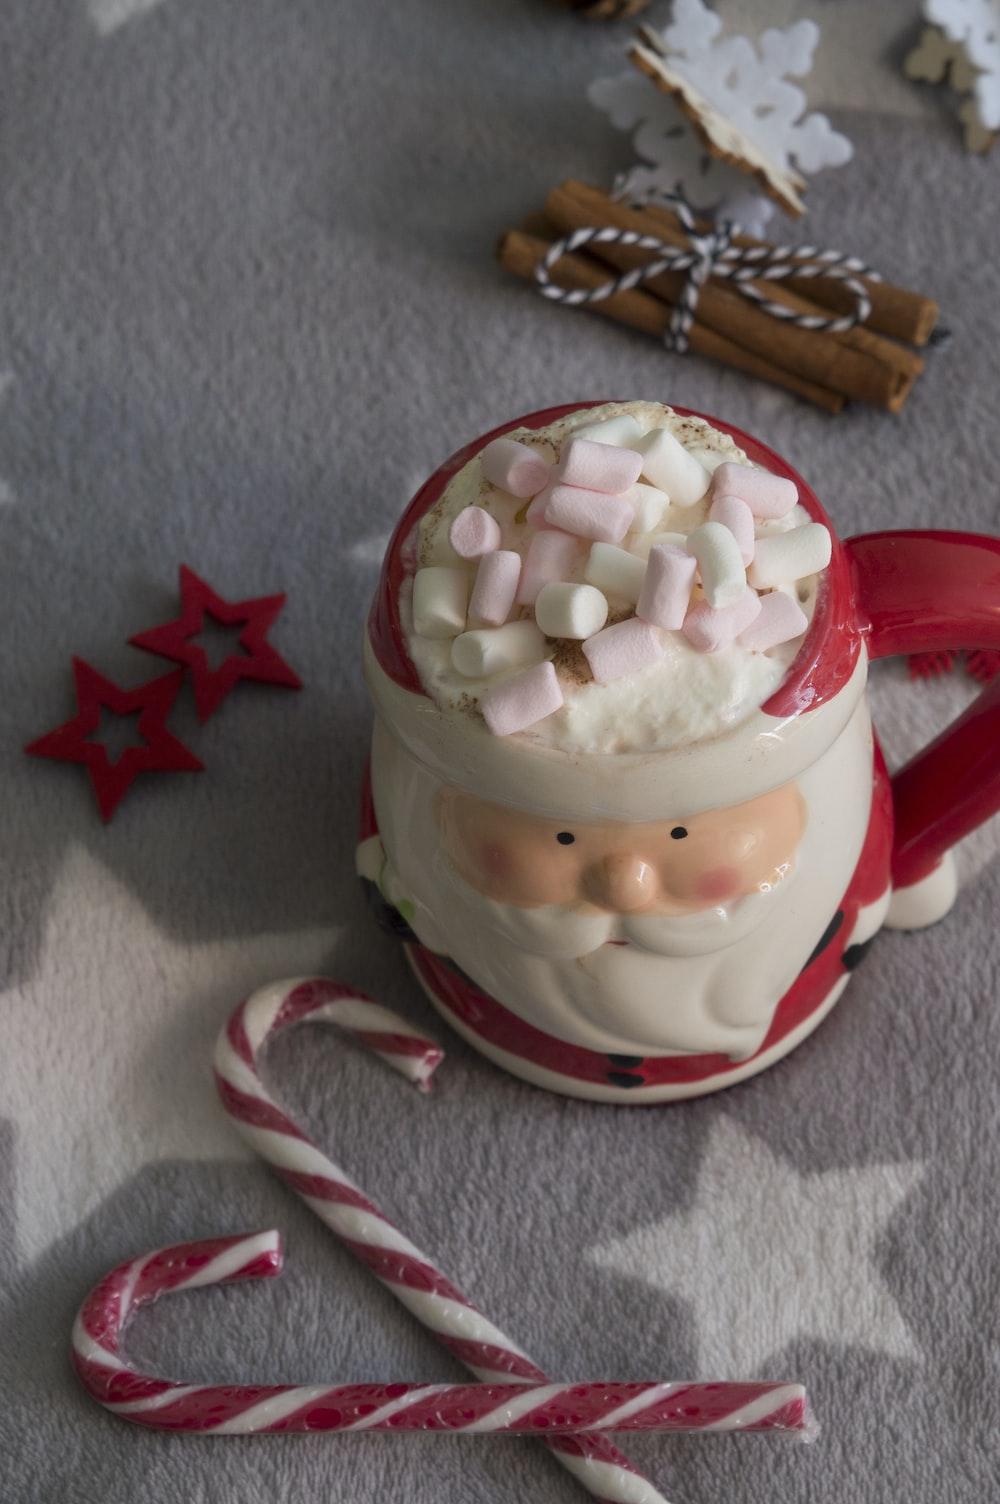 red and white Santa Claus ceramic mug